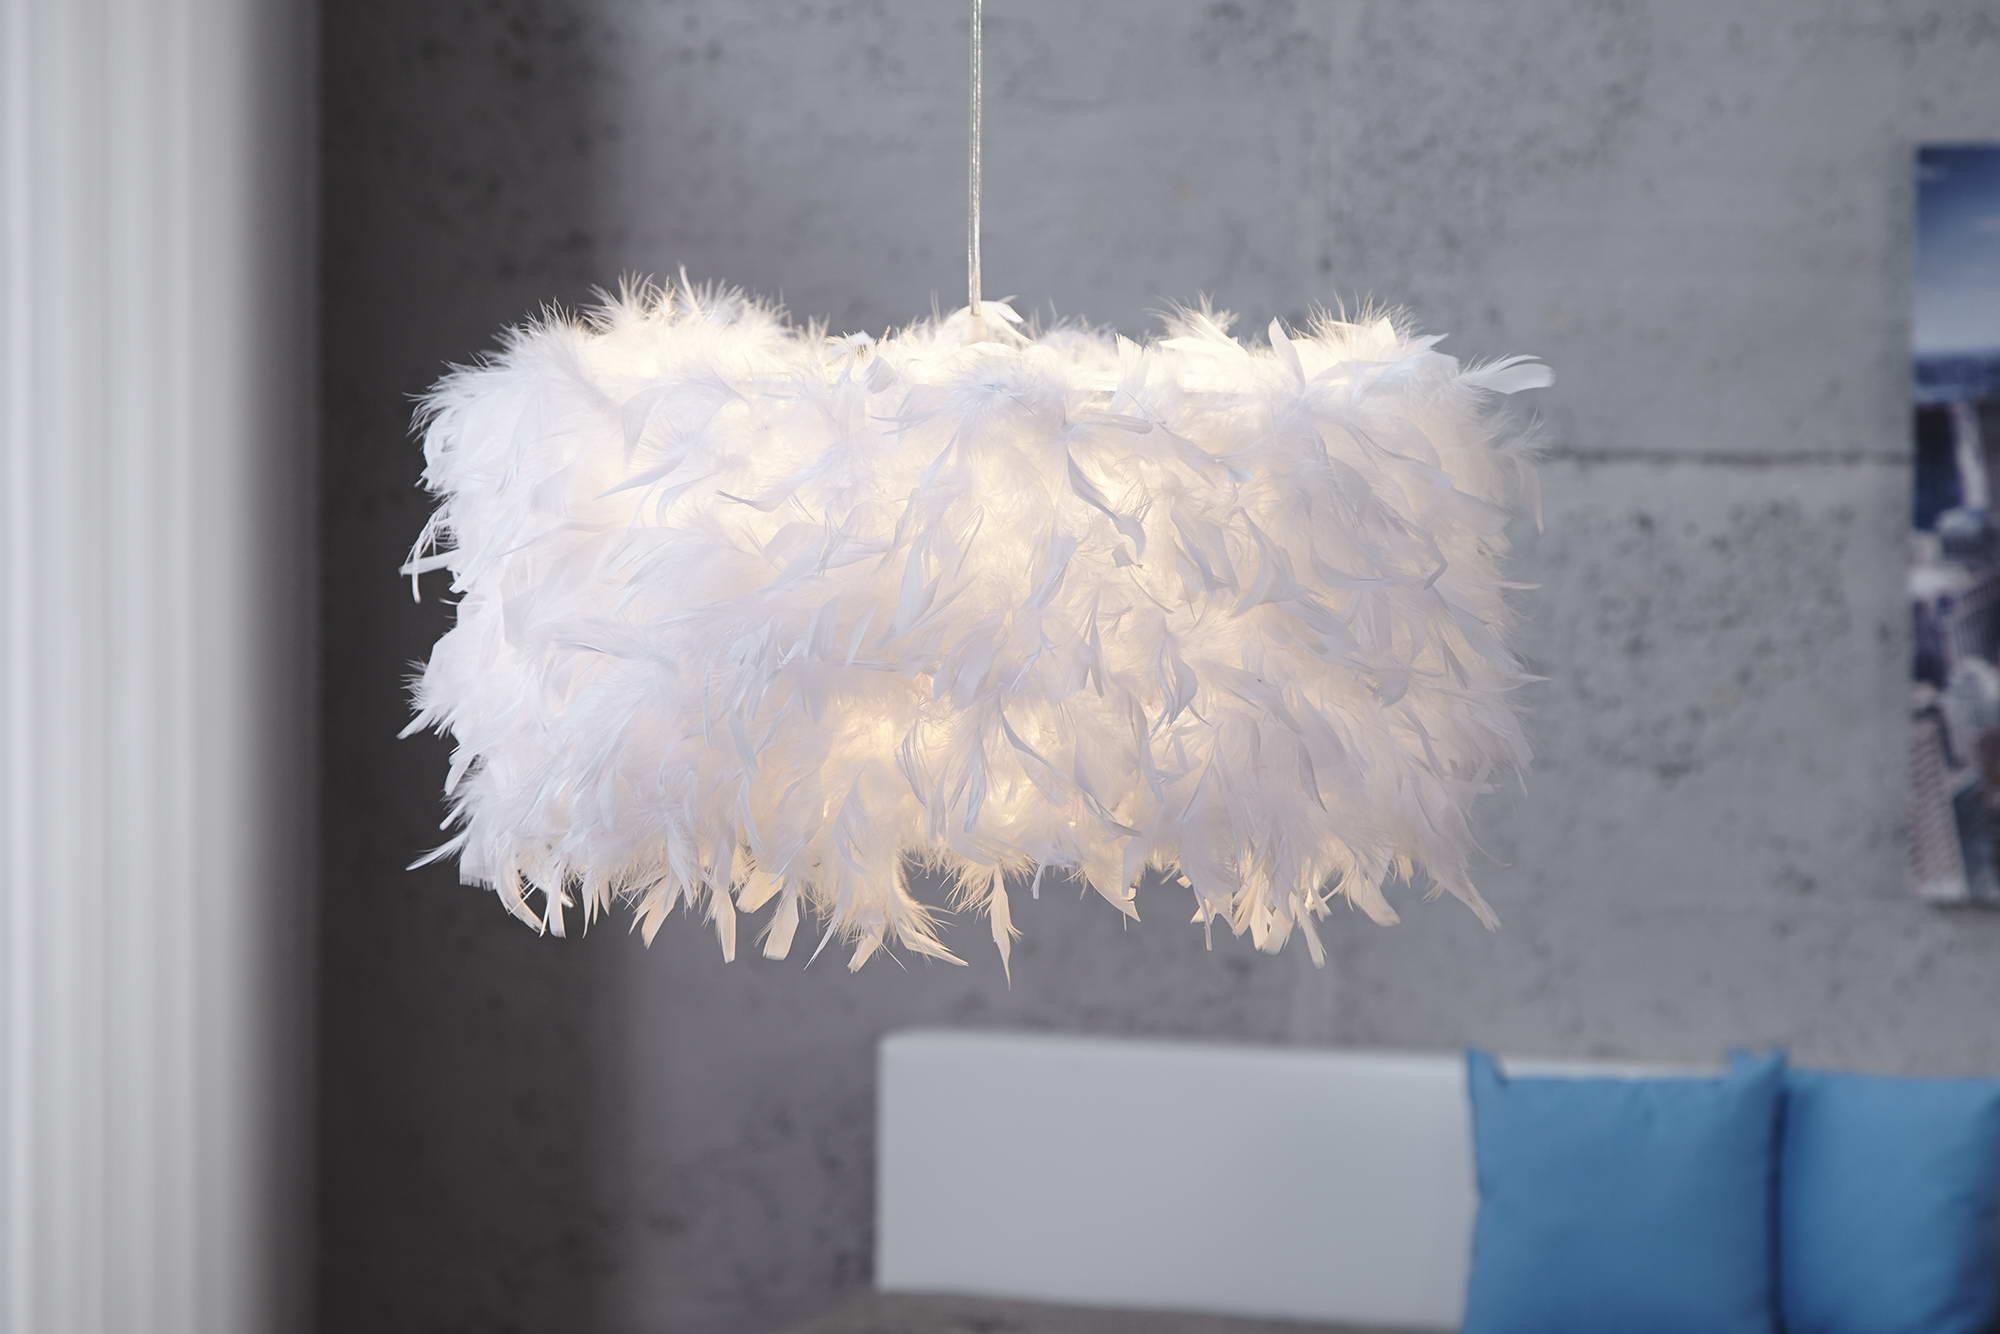 Lampa Feathers II